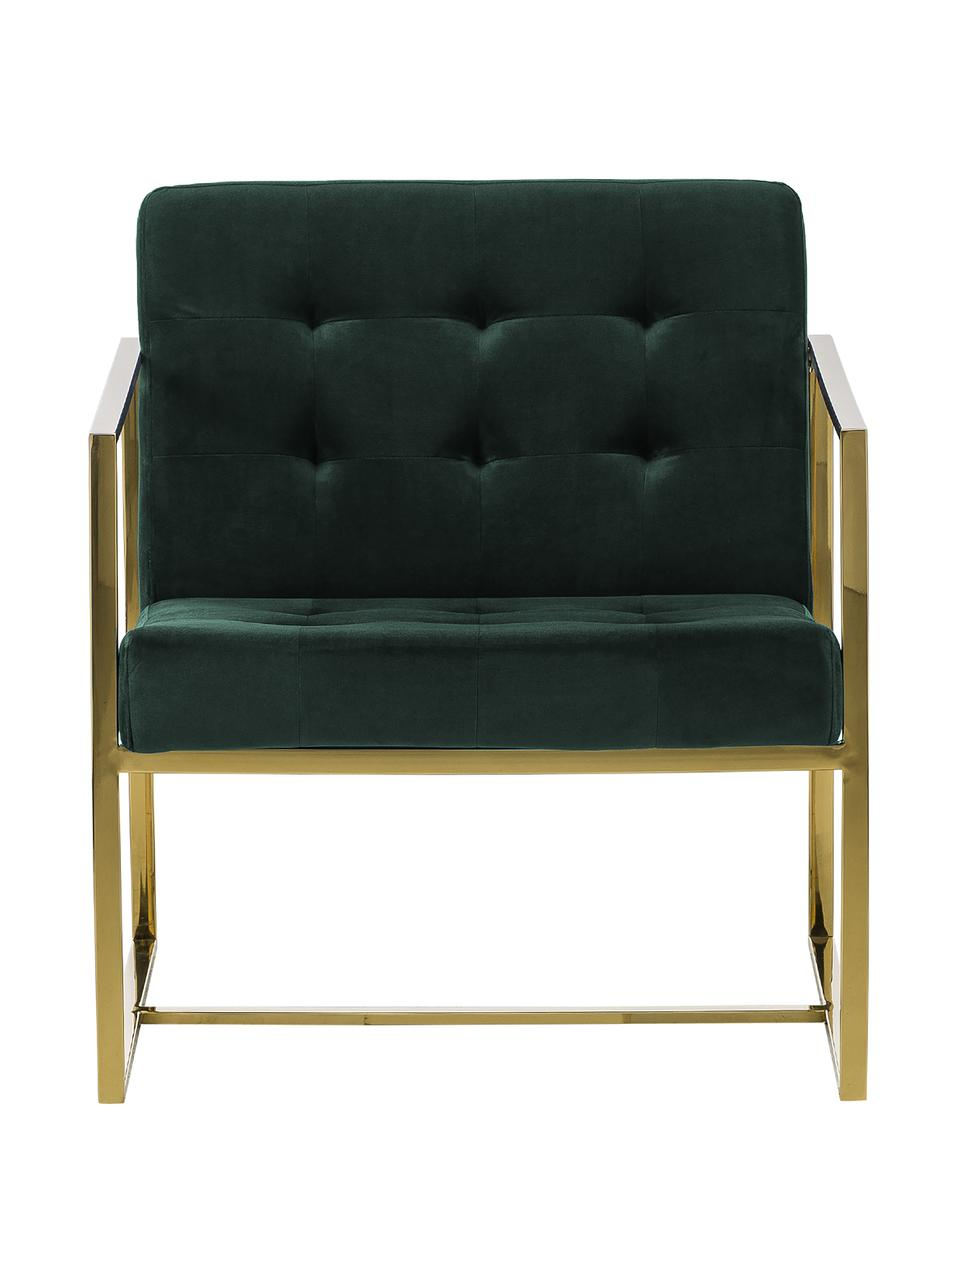 Fauteuil lounge en velours vert foncé Manhattan, Velours vert foncé